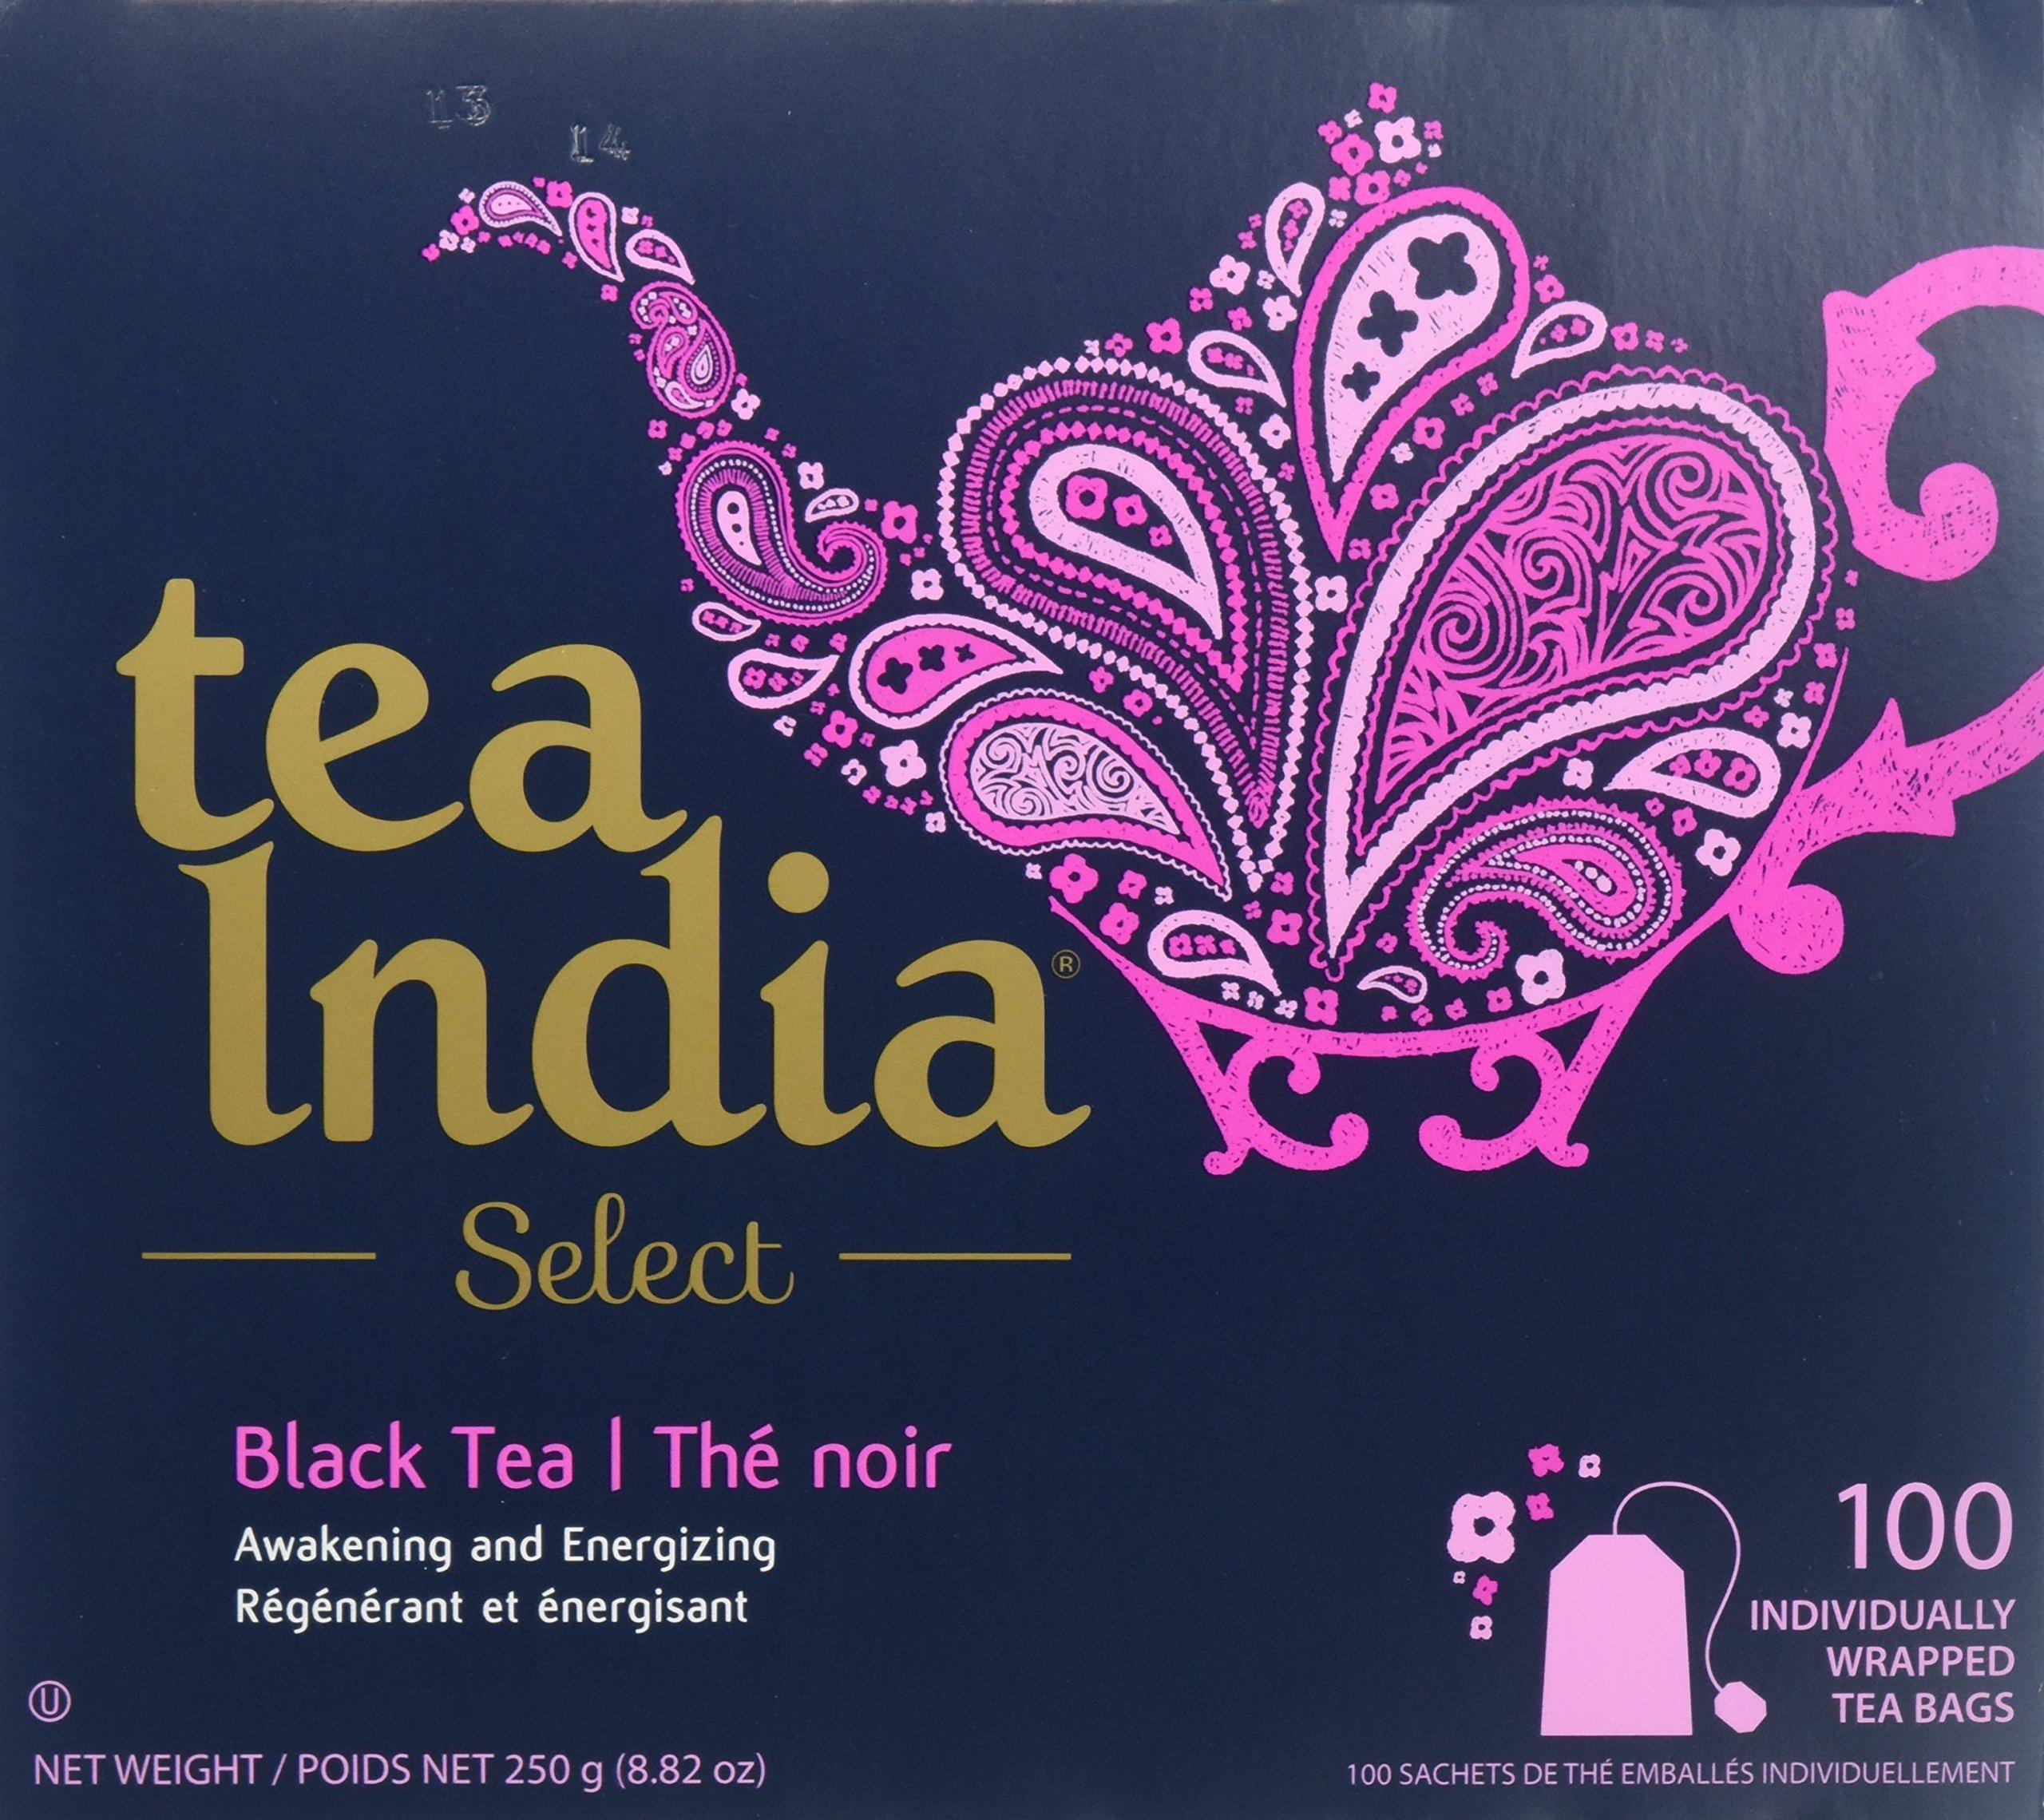 Tea India Select - Black tea - 100 tea bags